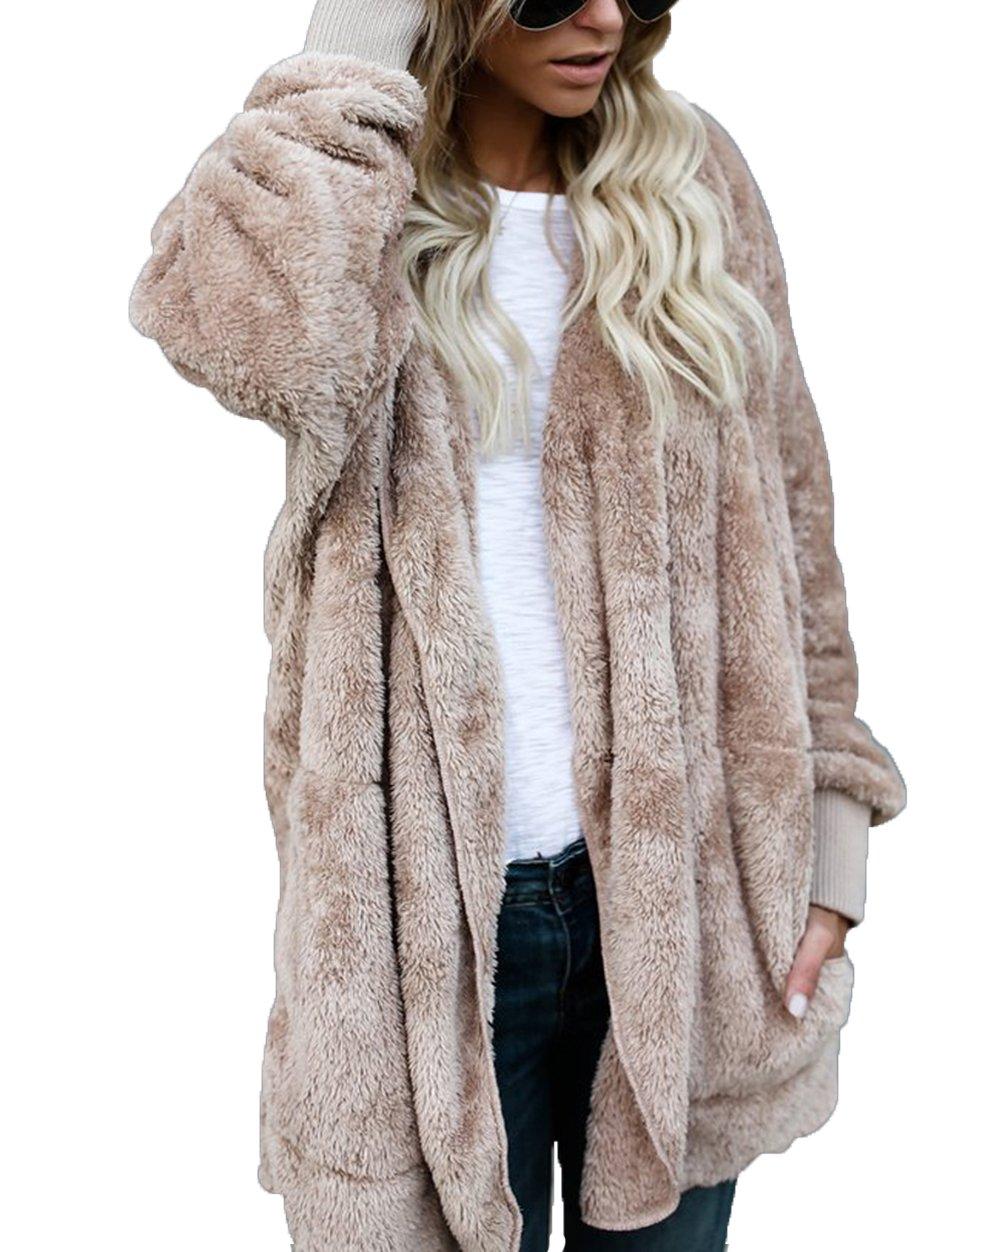 FOUNDO Womens Winter Fuzzy Long Sleeve Hooded Open Front Cardigans Trench Coats Khaki M